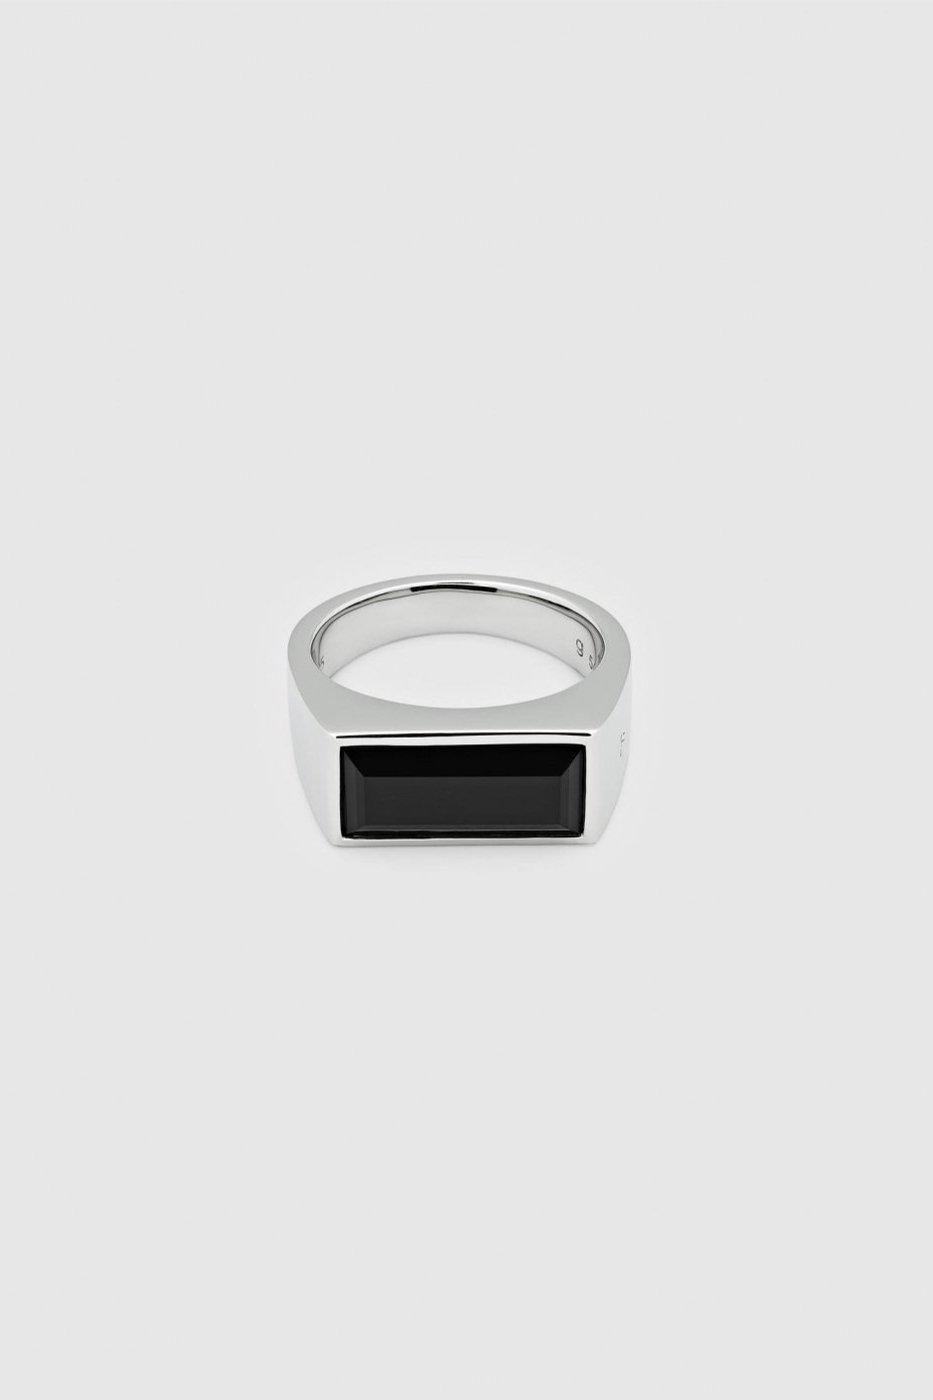 TOM WOOD トムウッド-Peaky Ring Polished Onyx-